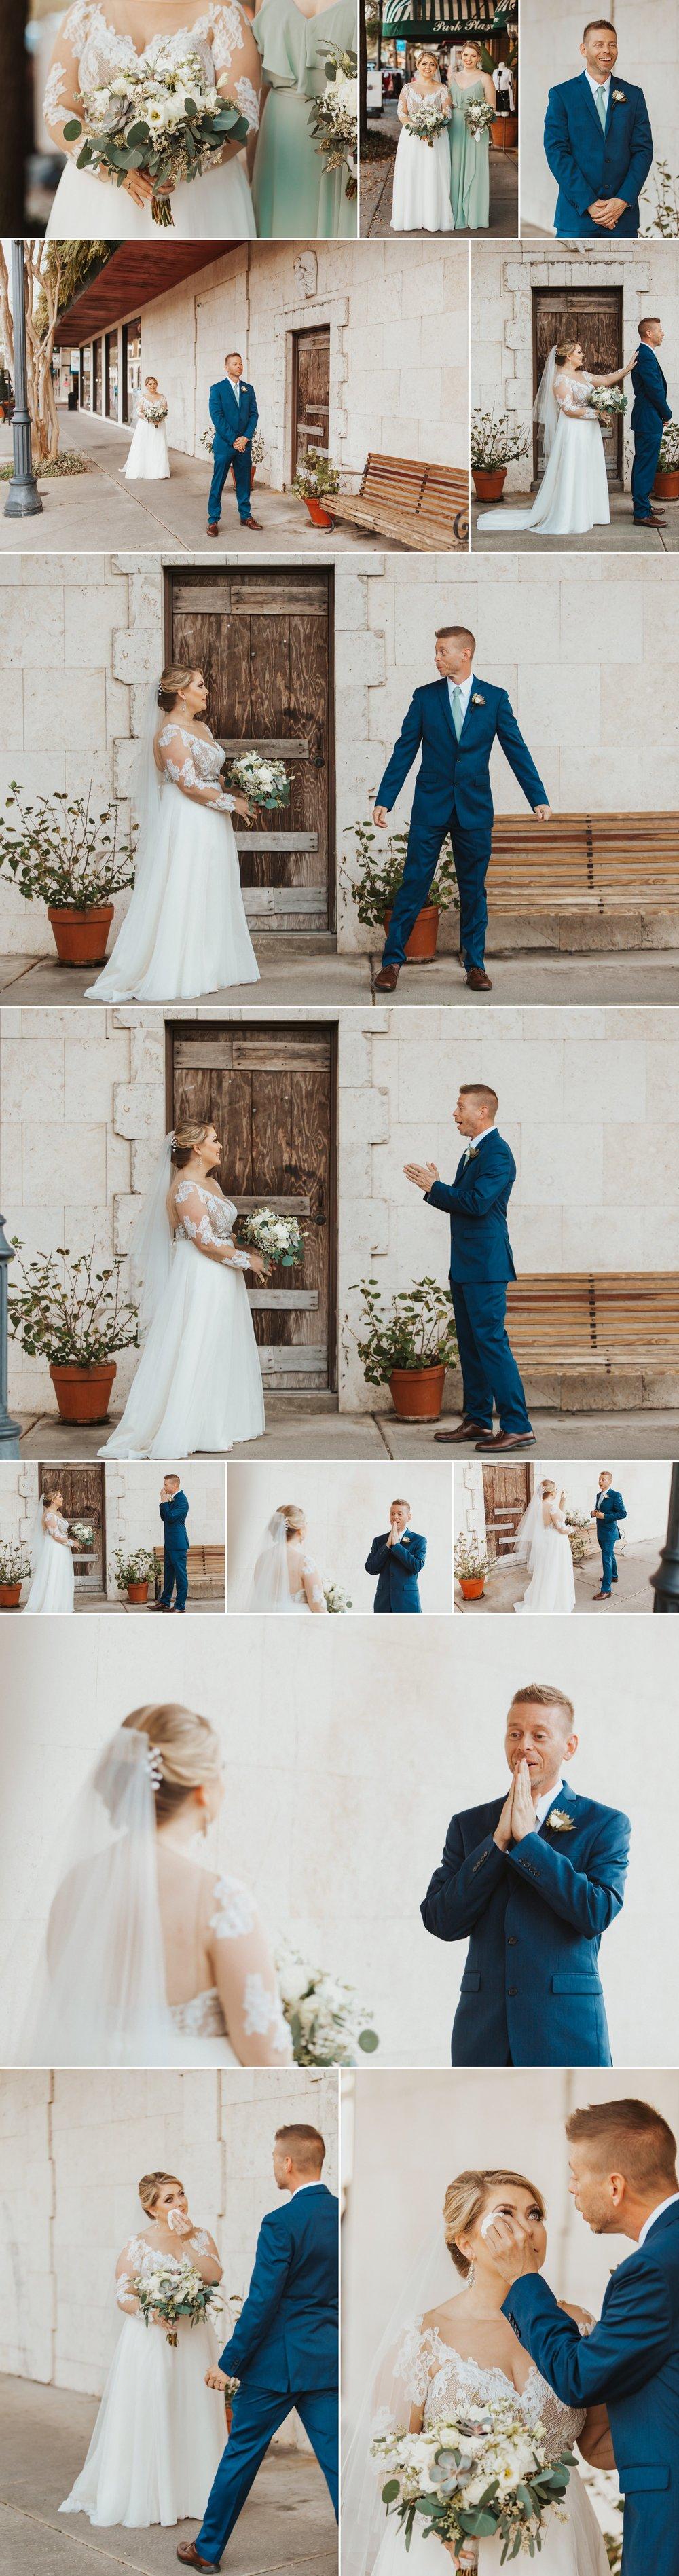 Winter_Park_Farmers_Market_Wedding_Photography_French_Rustic_Inspired_ShainaDeCiryan.com5.jpg